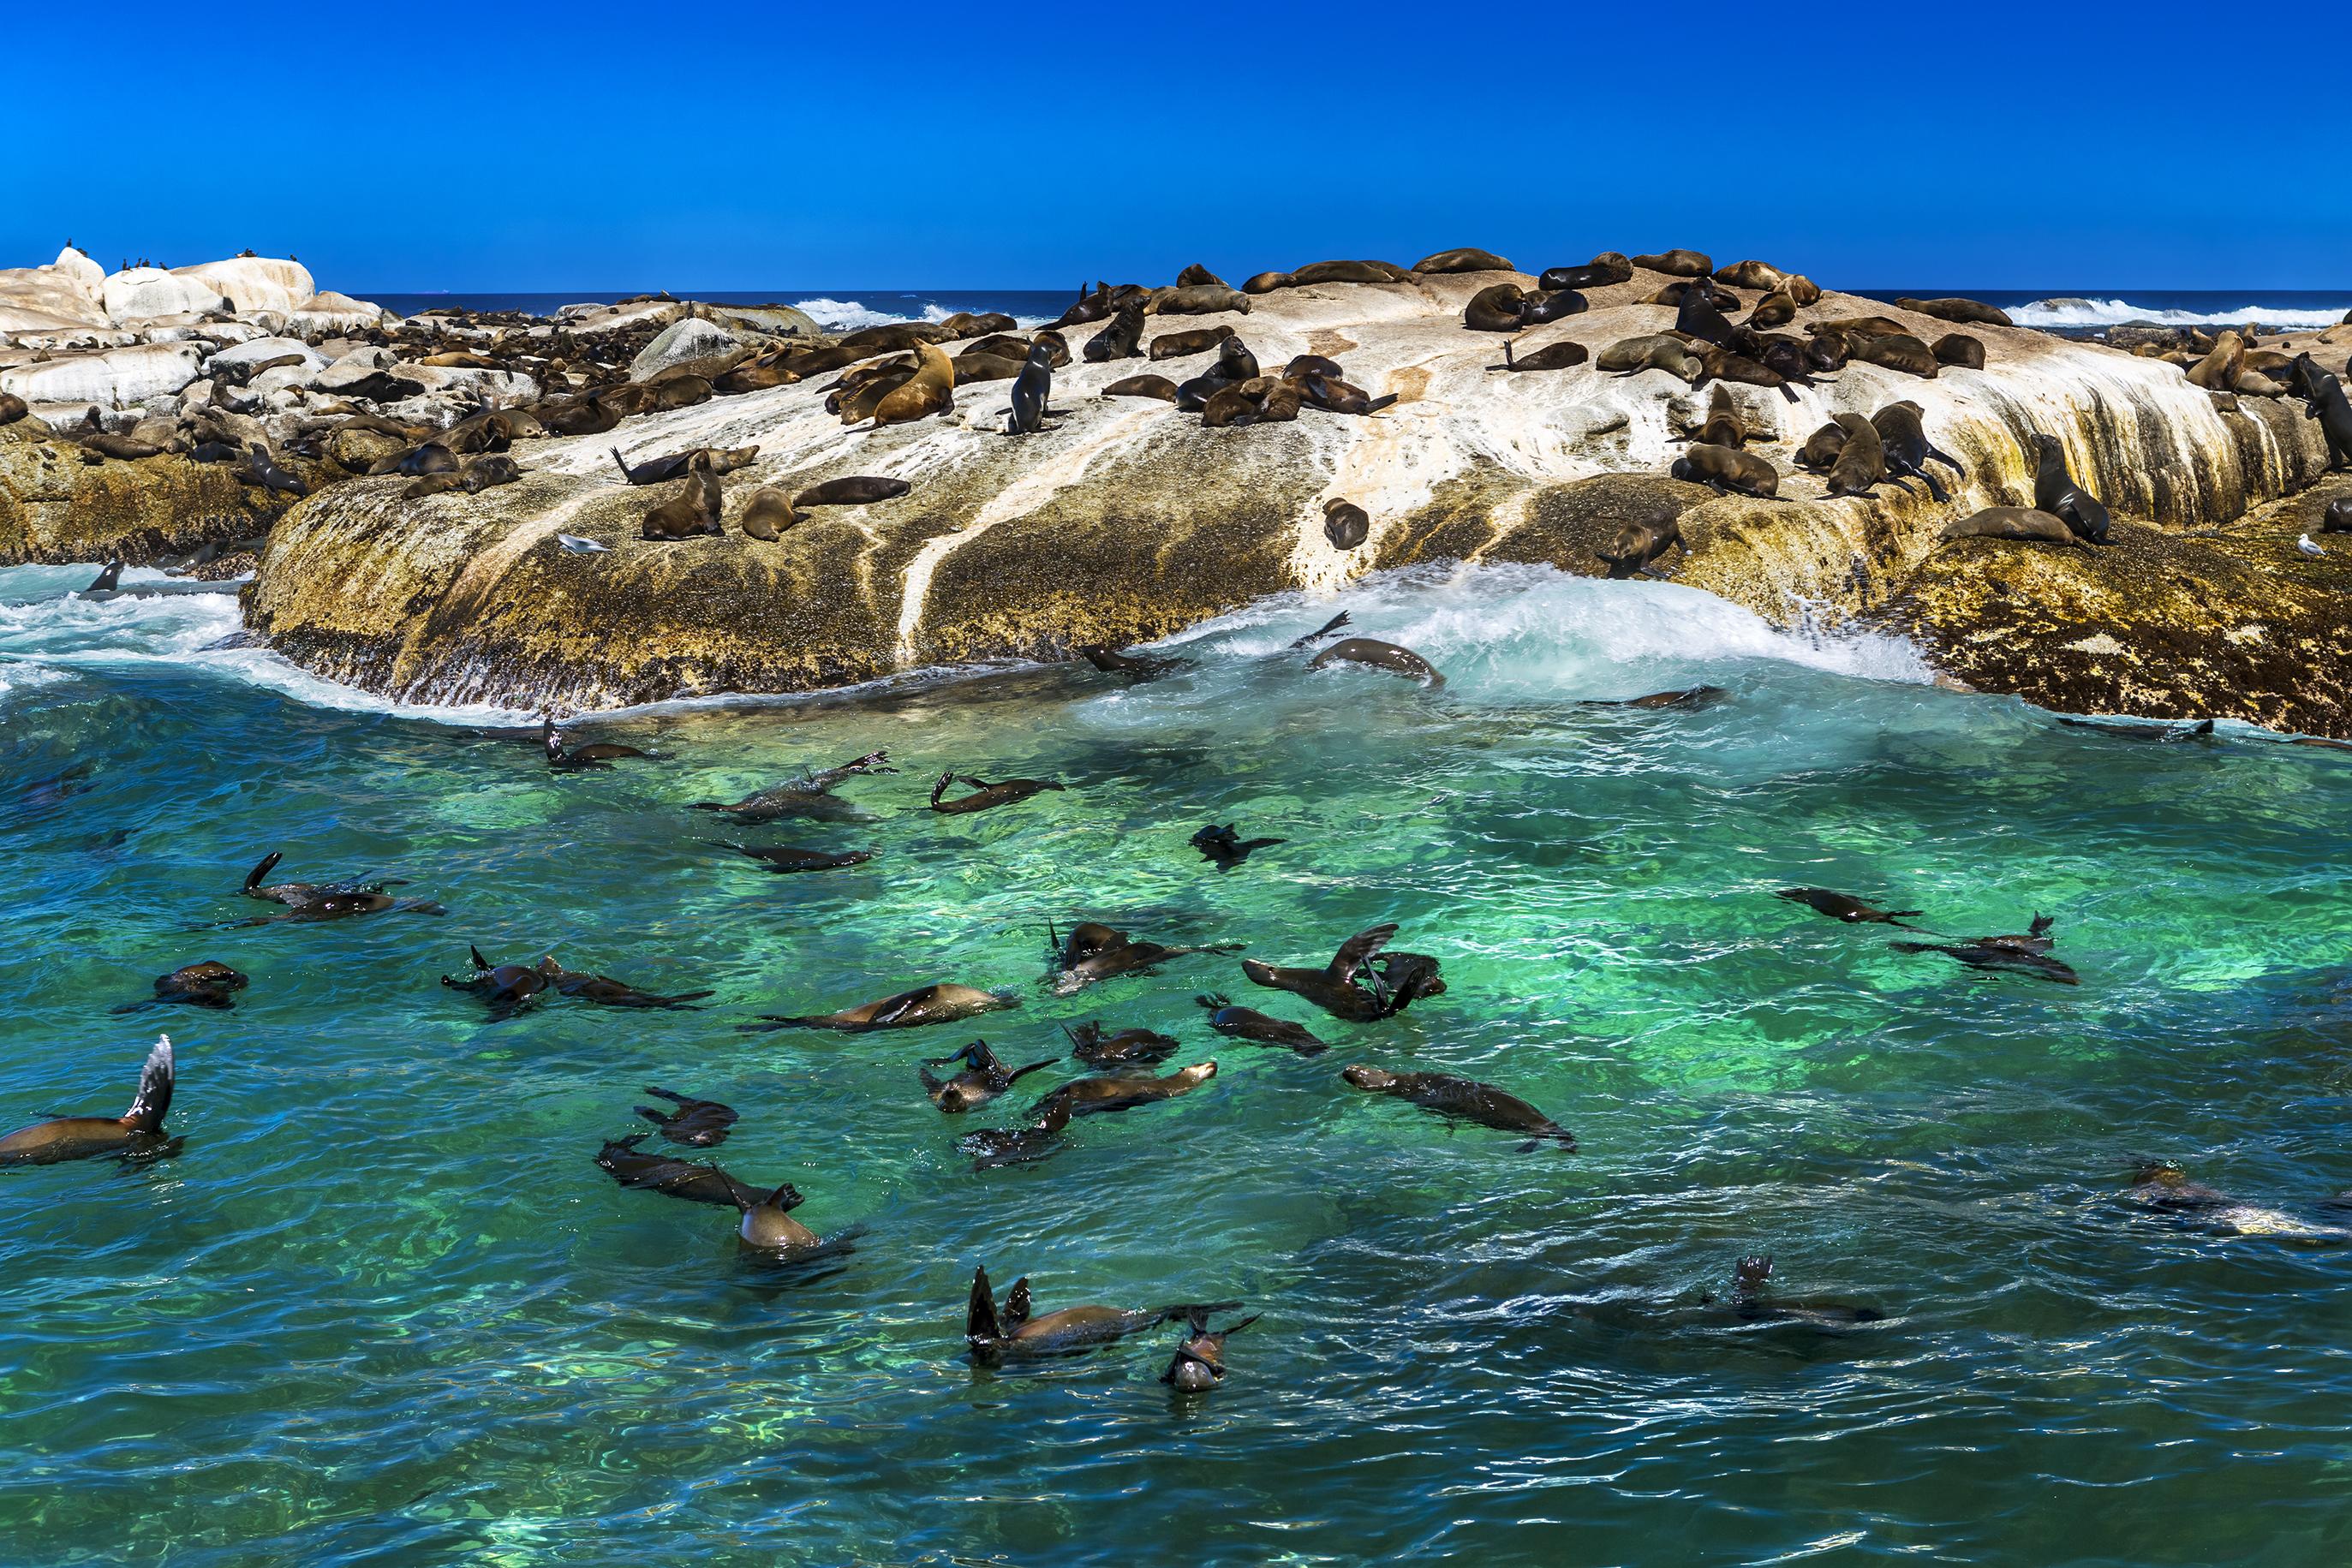 Fur seals on Duiker Island